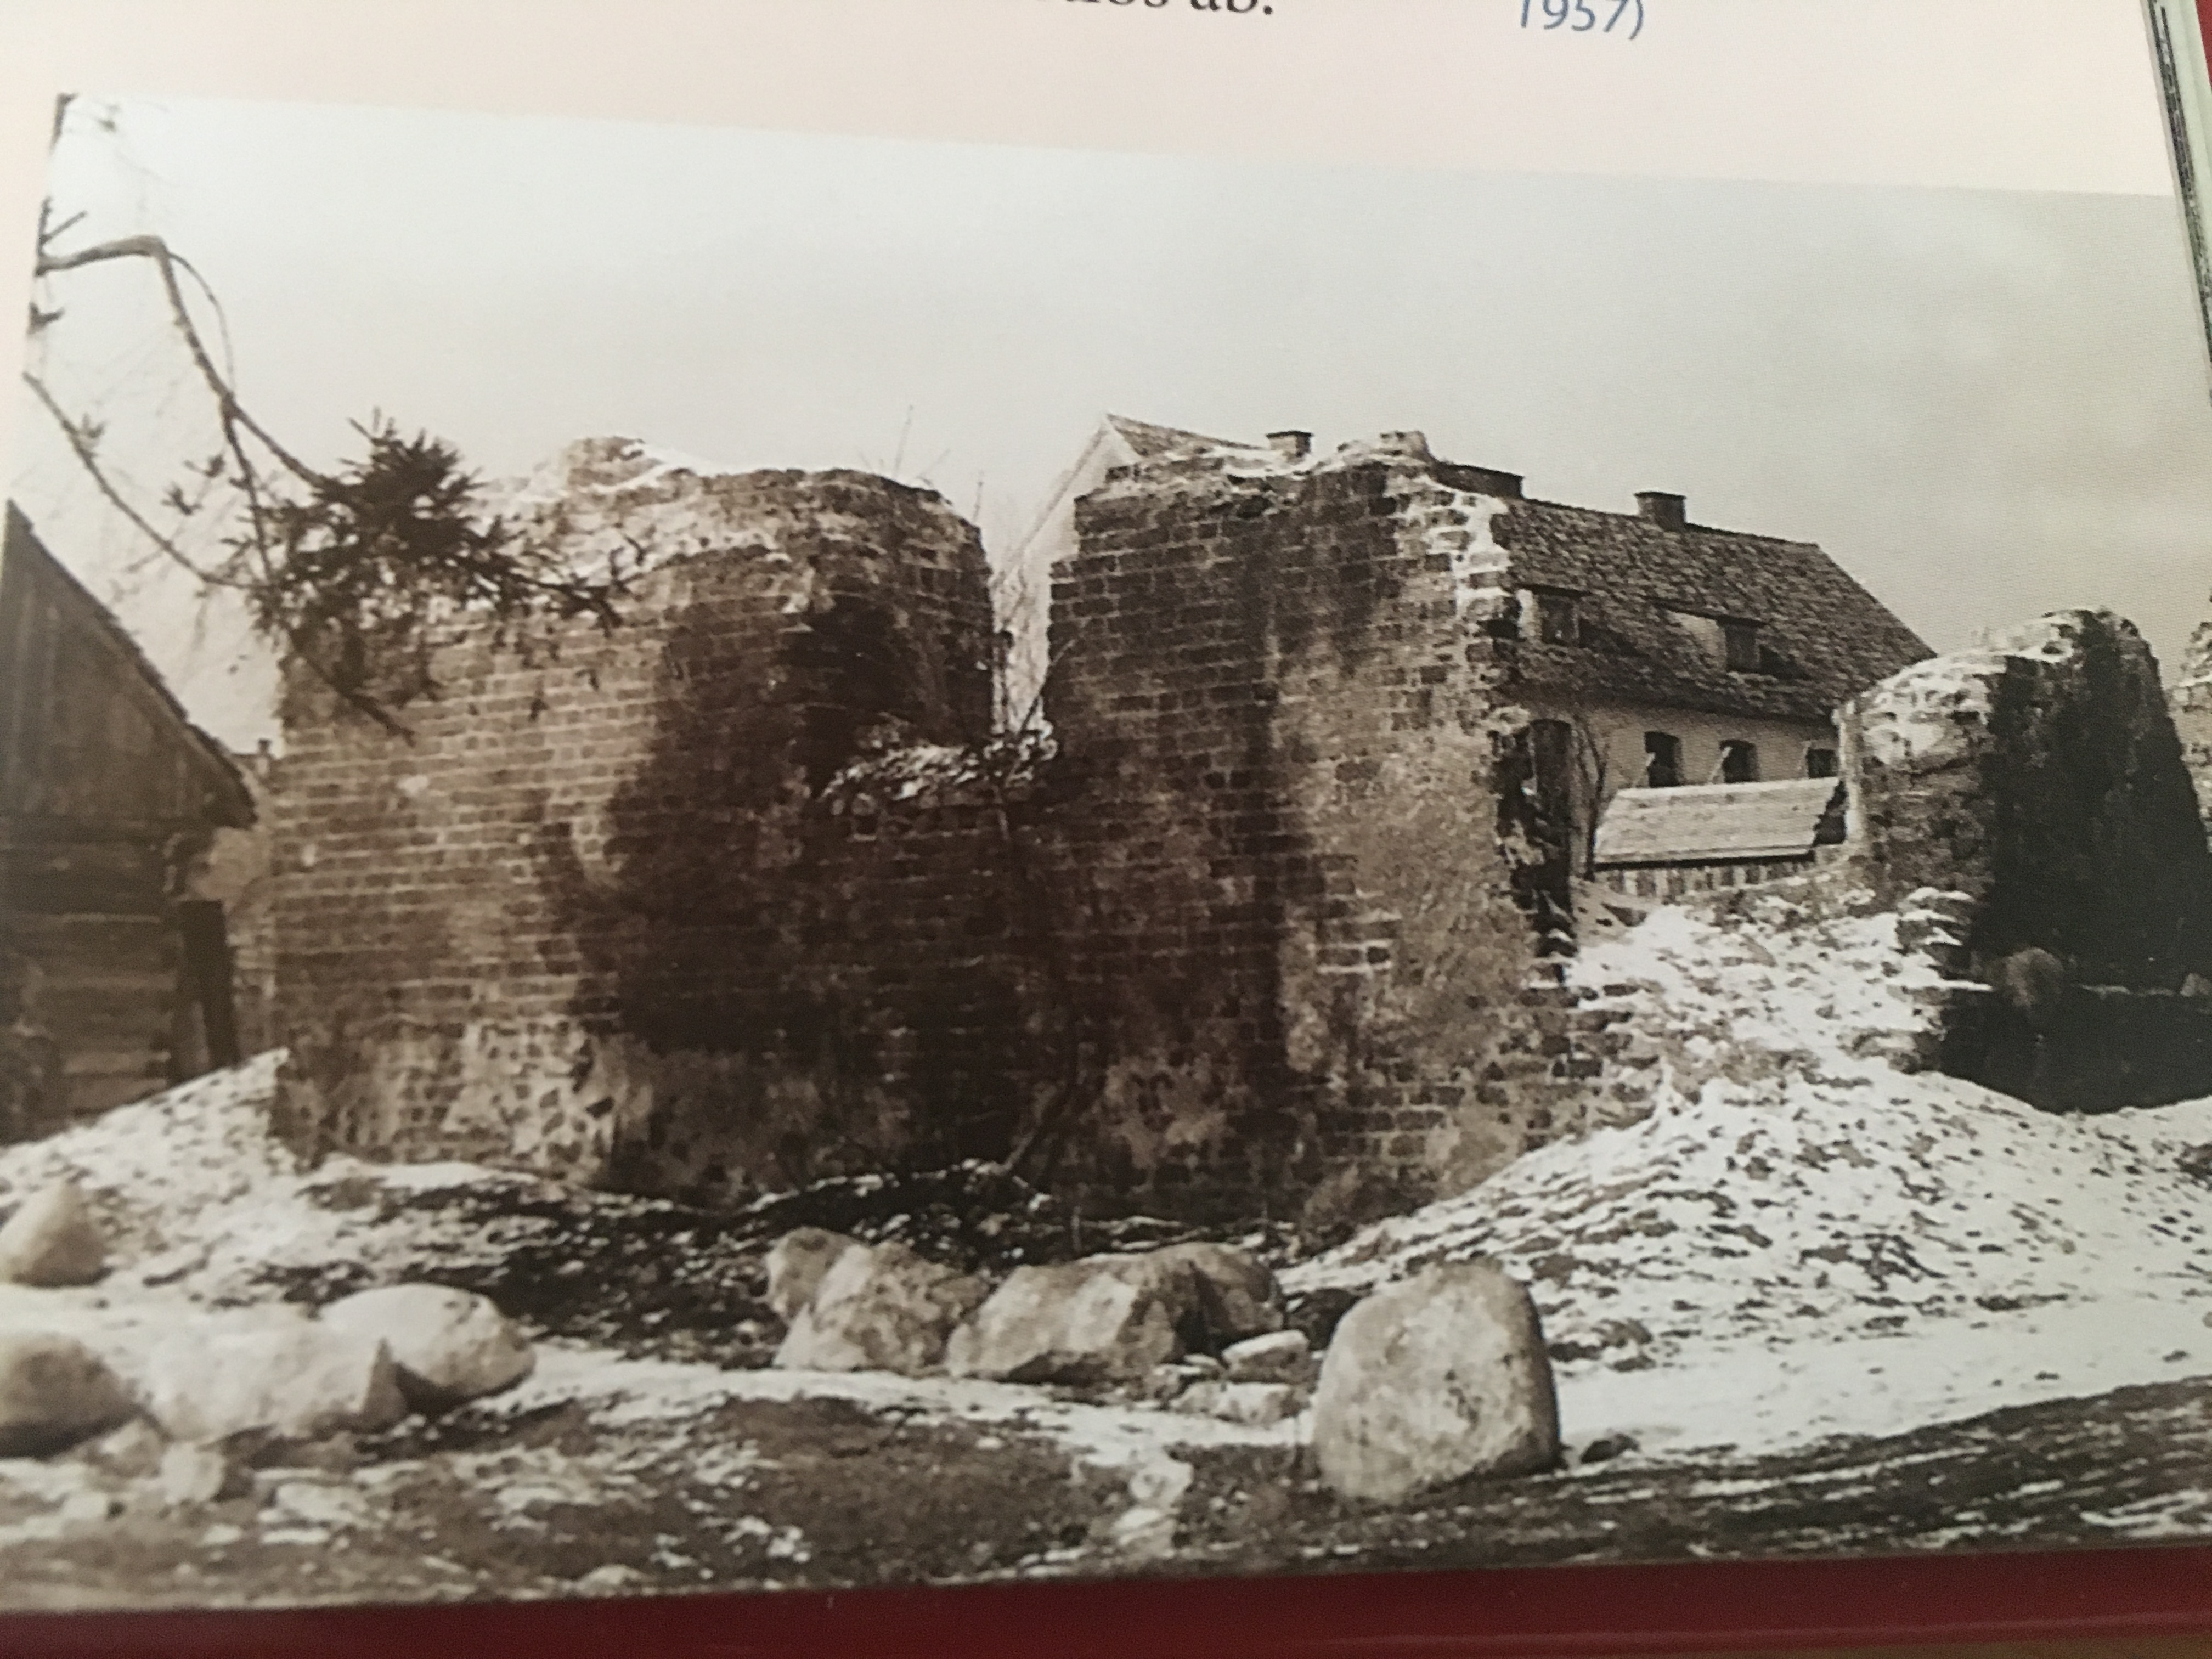 Burgen im Ordensland Preussen-Teil 2 Johannisburg